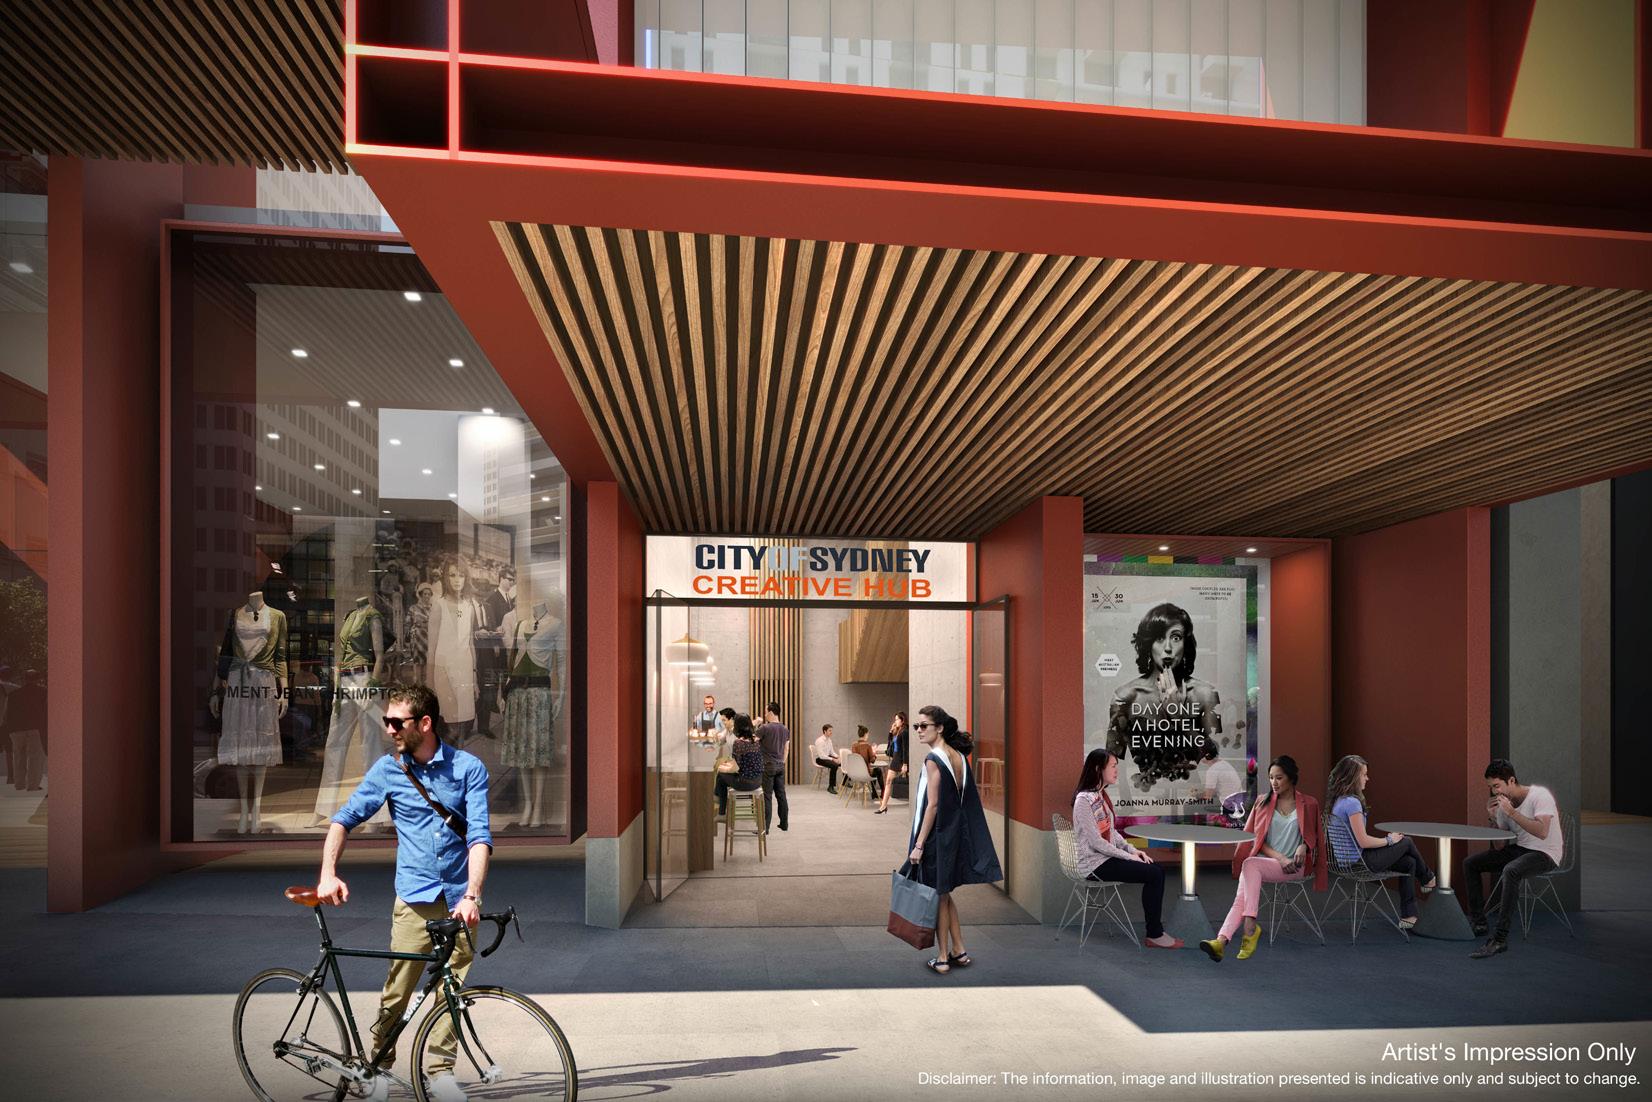 Artist's Impression of the Bathurst Street Creative Hub. Image Credit: City of Sydney.